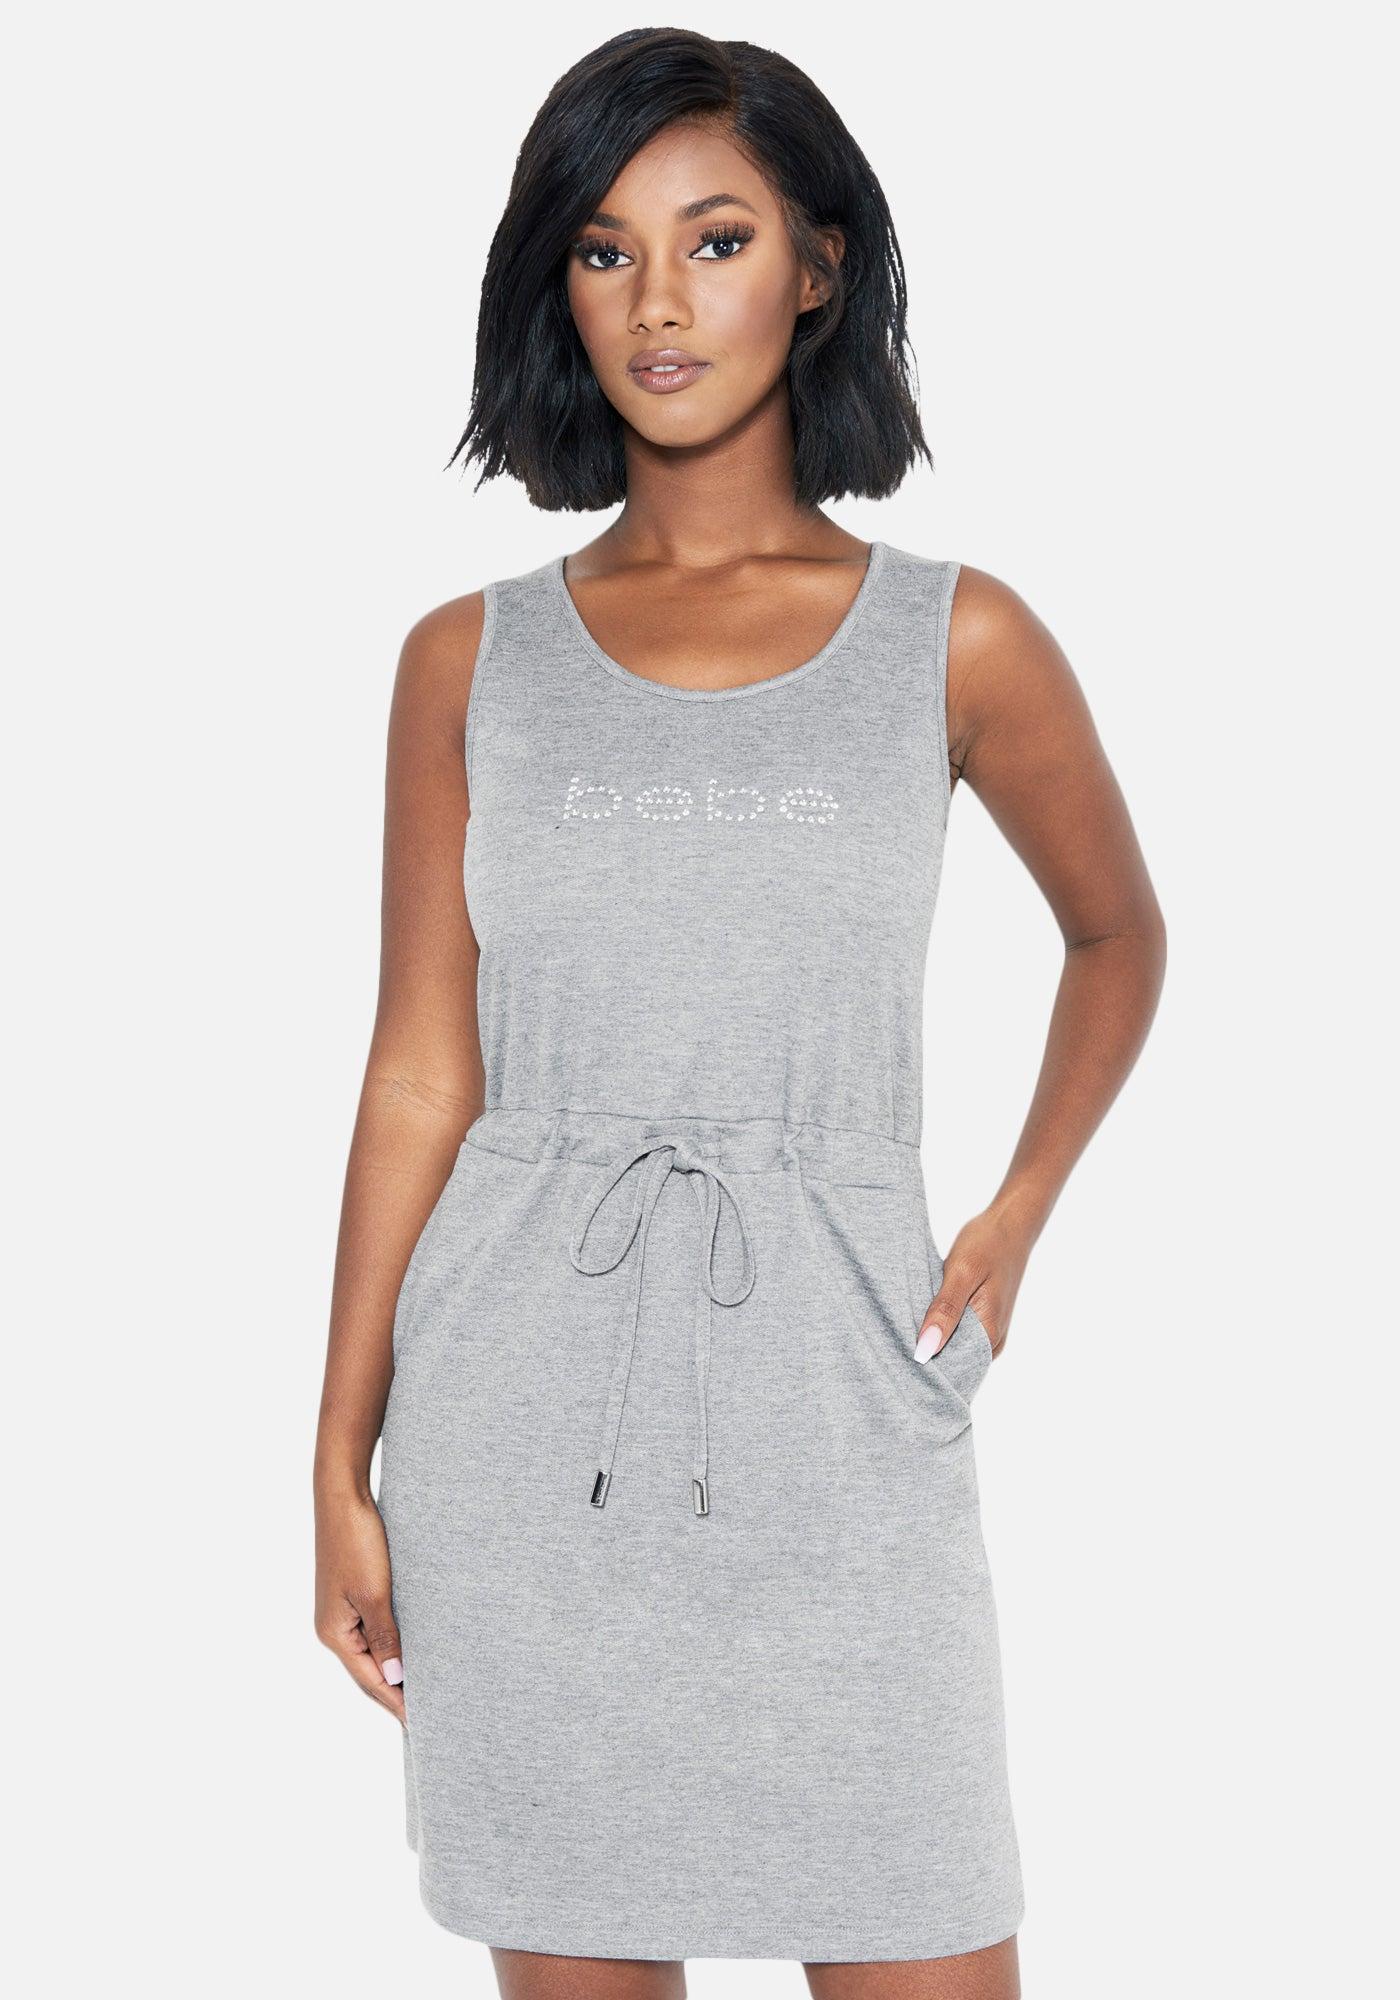 Bebe Women's French Terry Tank Dress, Size XS in Heather Grey Spandex